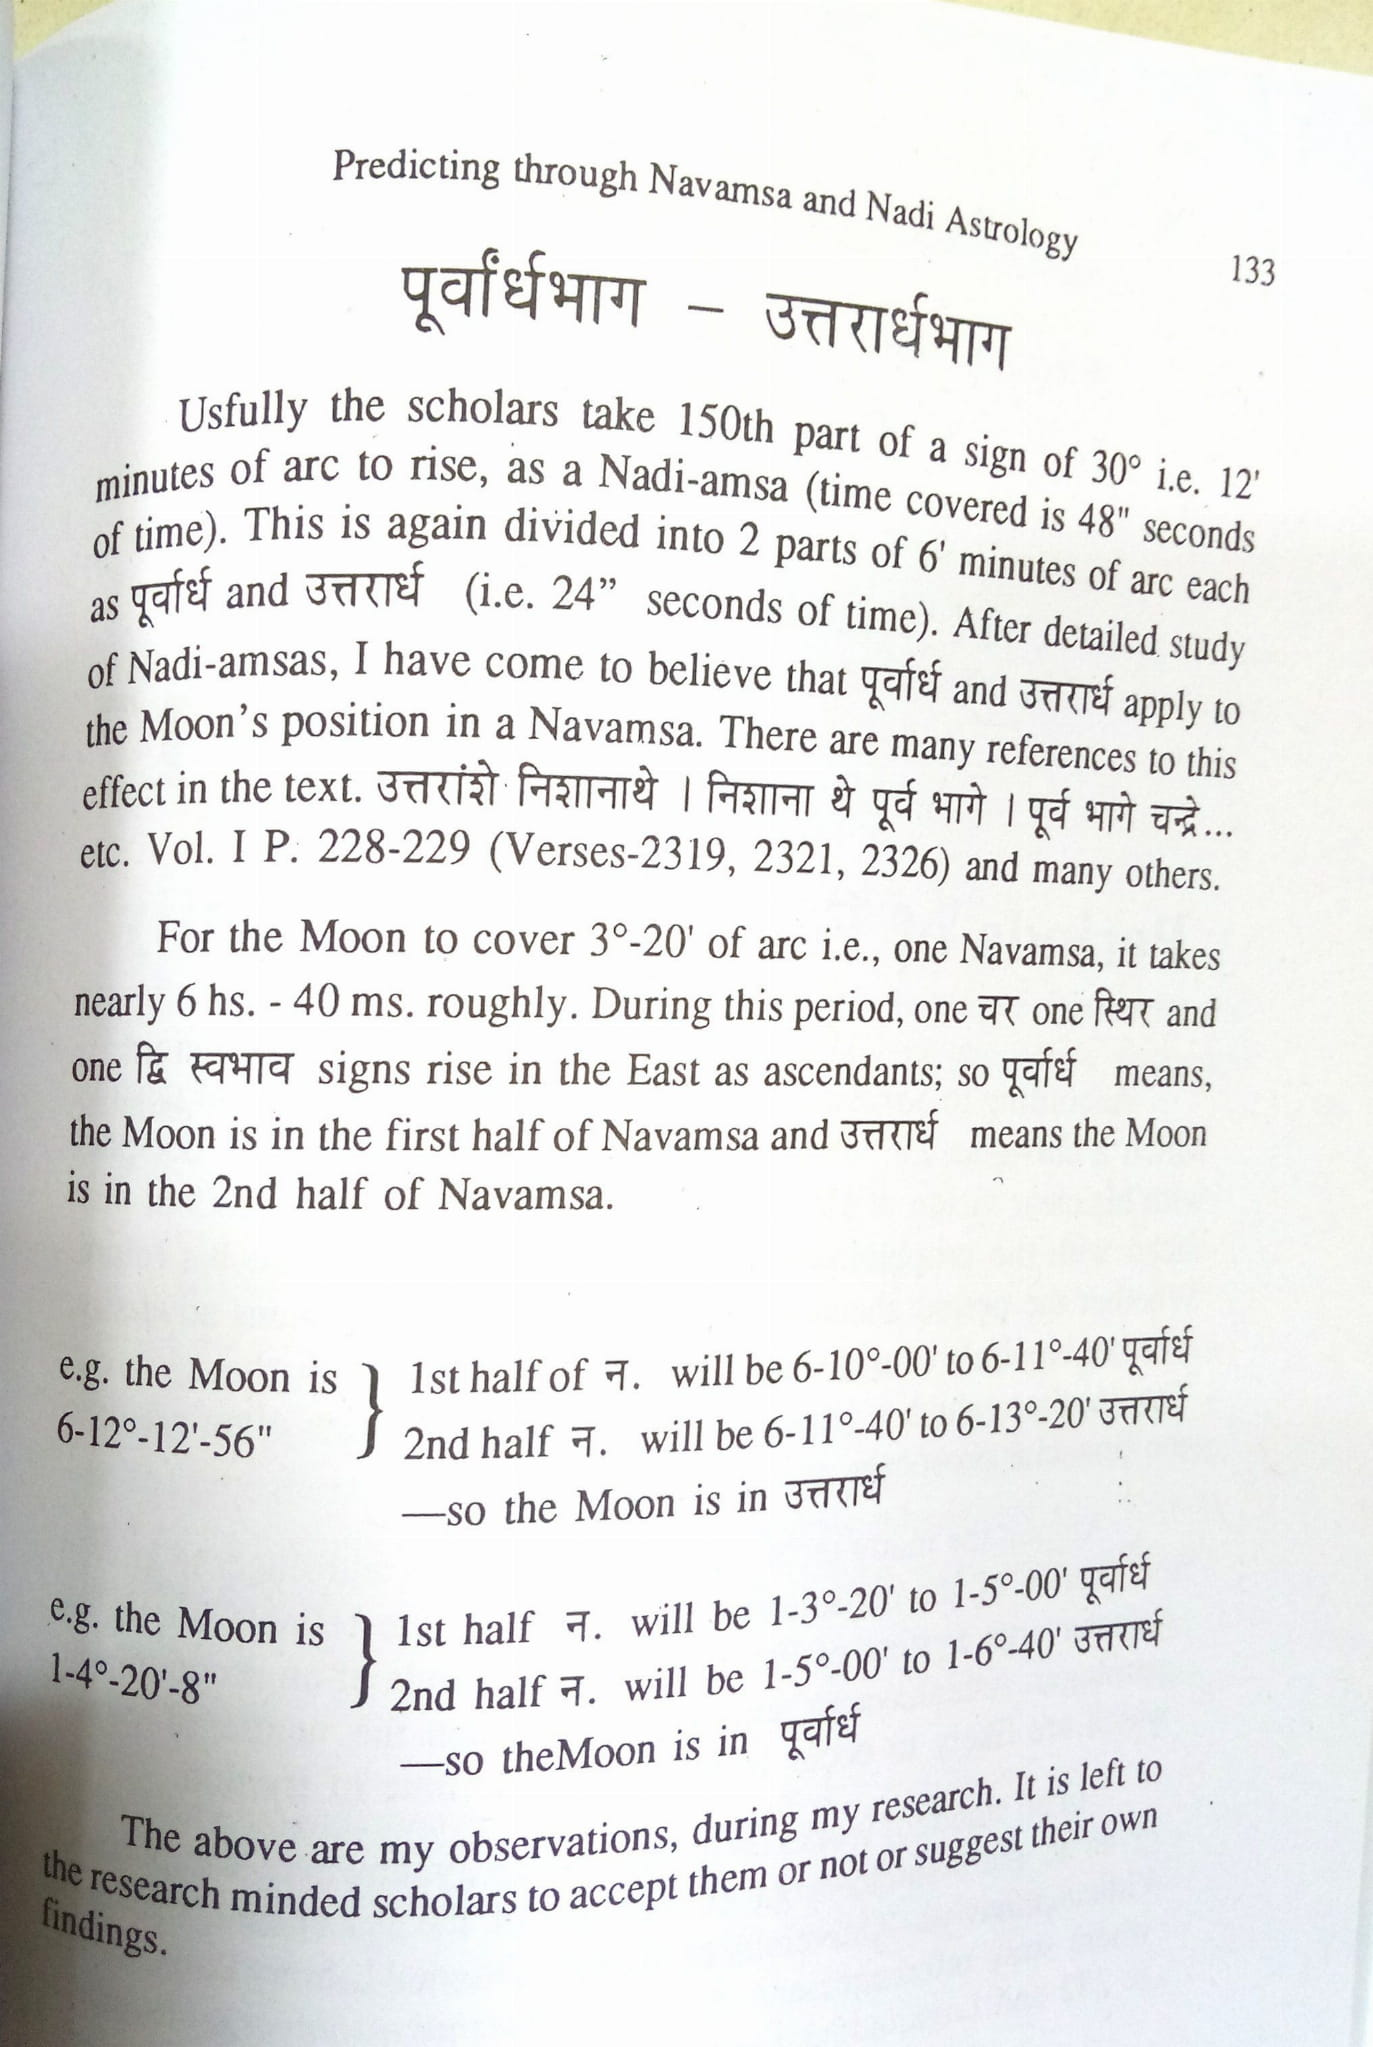 Predicting Trough Navamsa Nadi Asrology by Shri  C S Patel [SP]